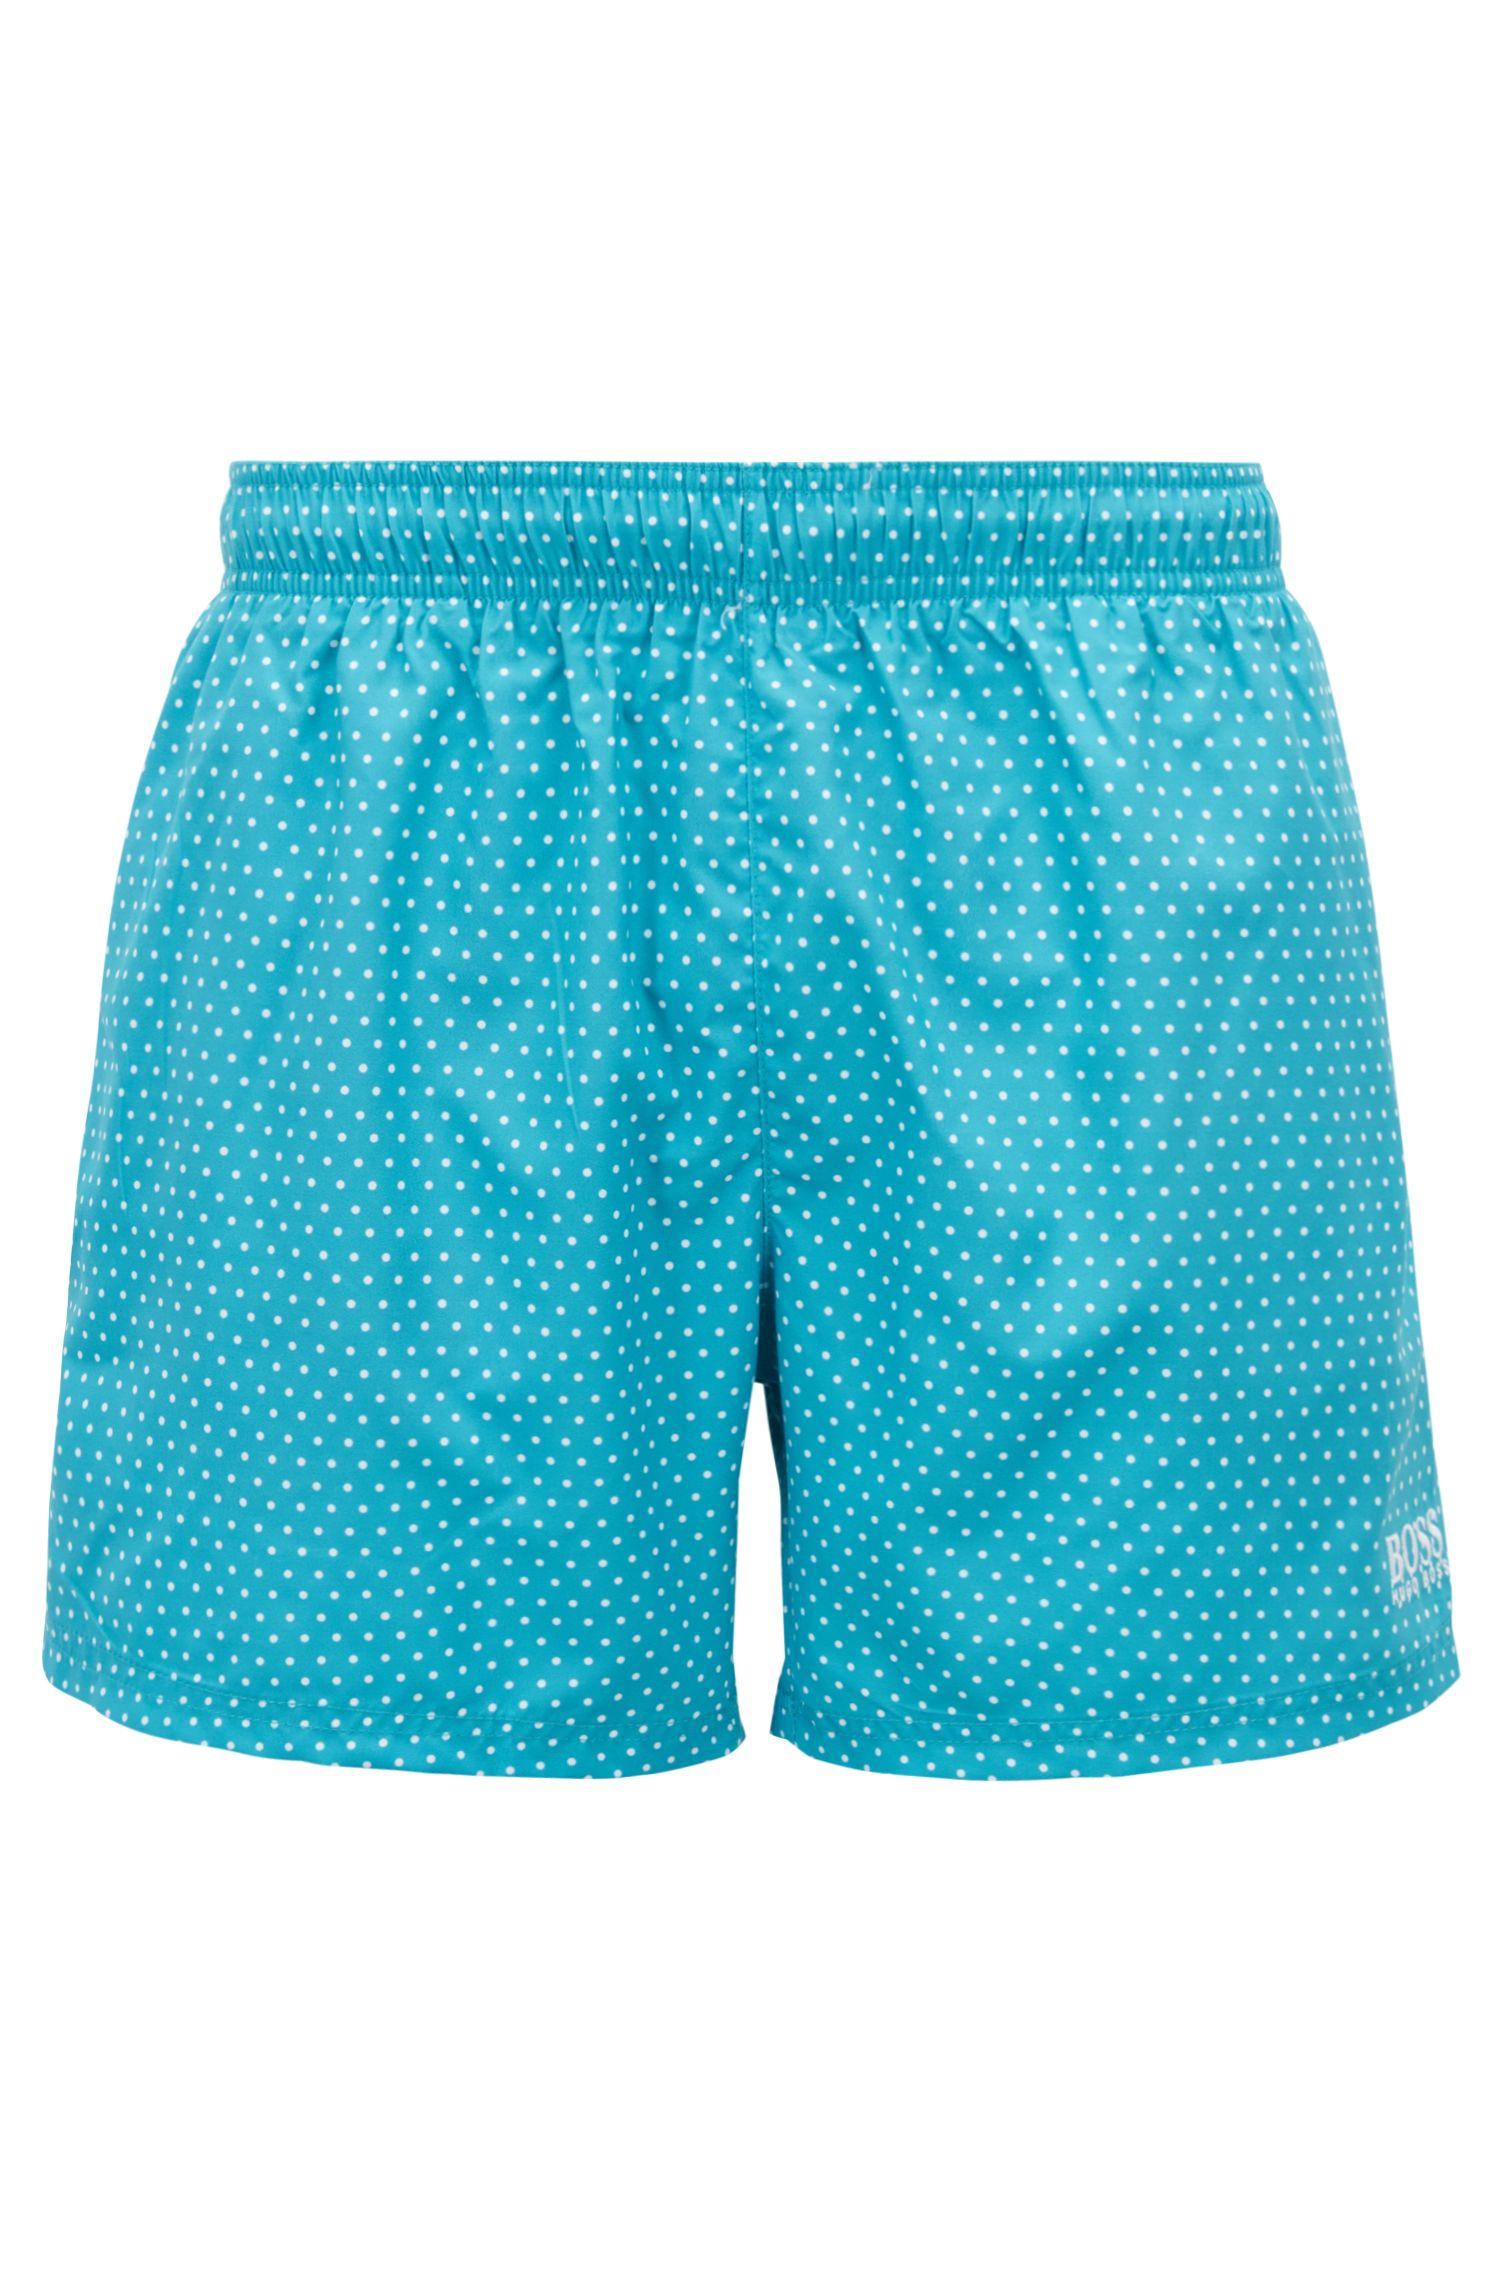 Bañador tipo shorts corto con diseño estampado en lámina, Turquesa